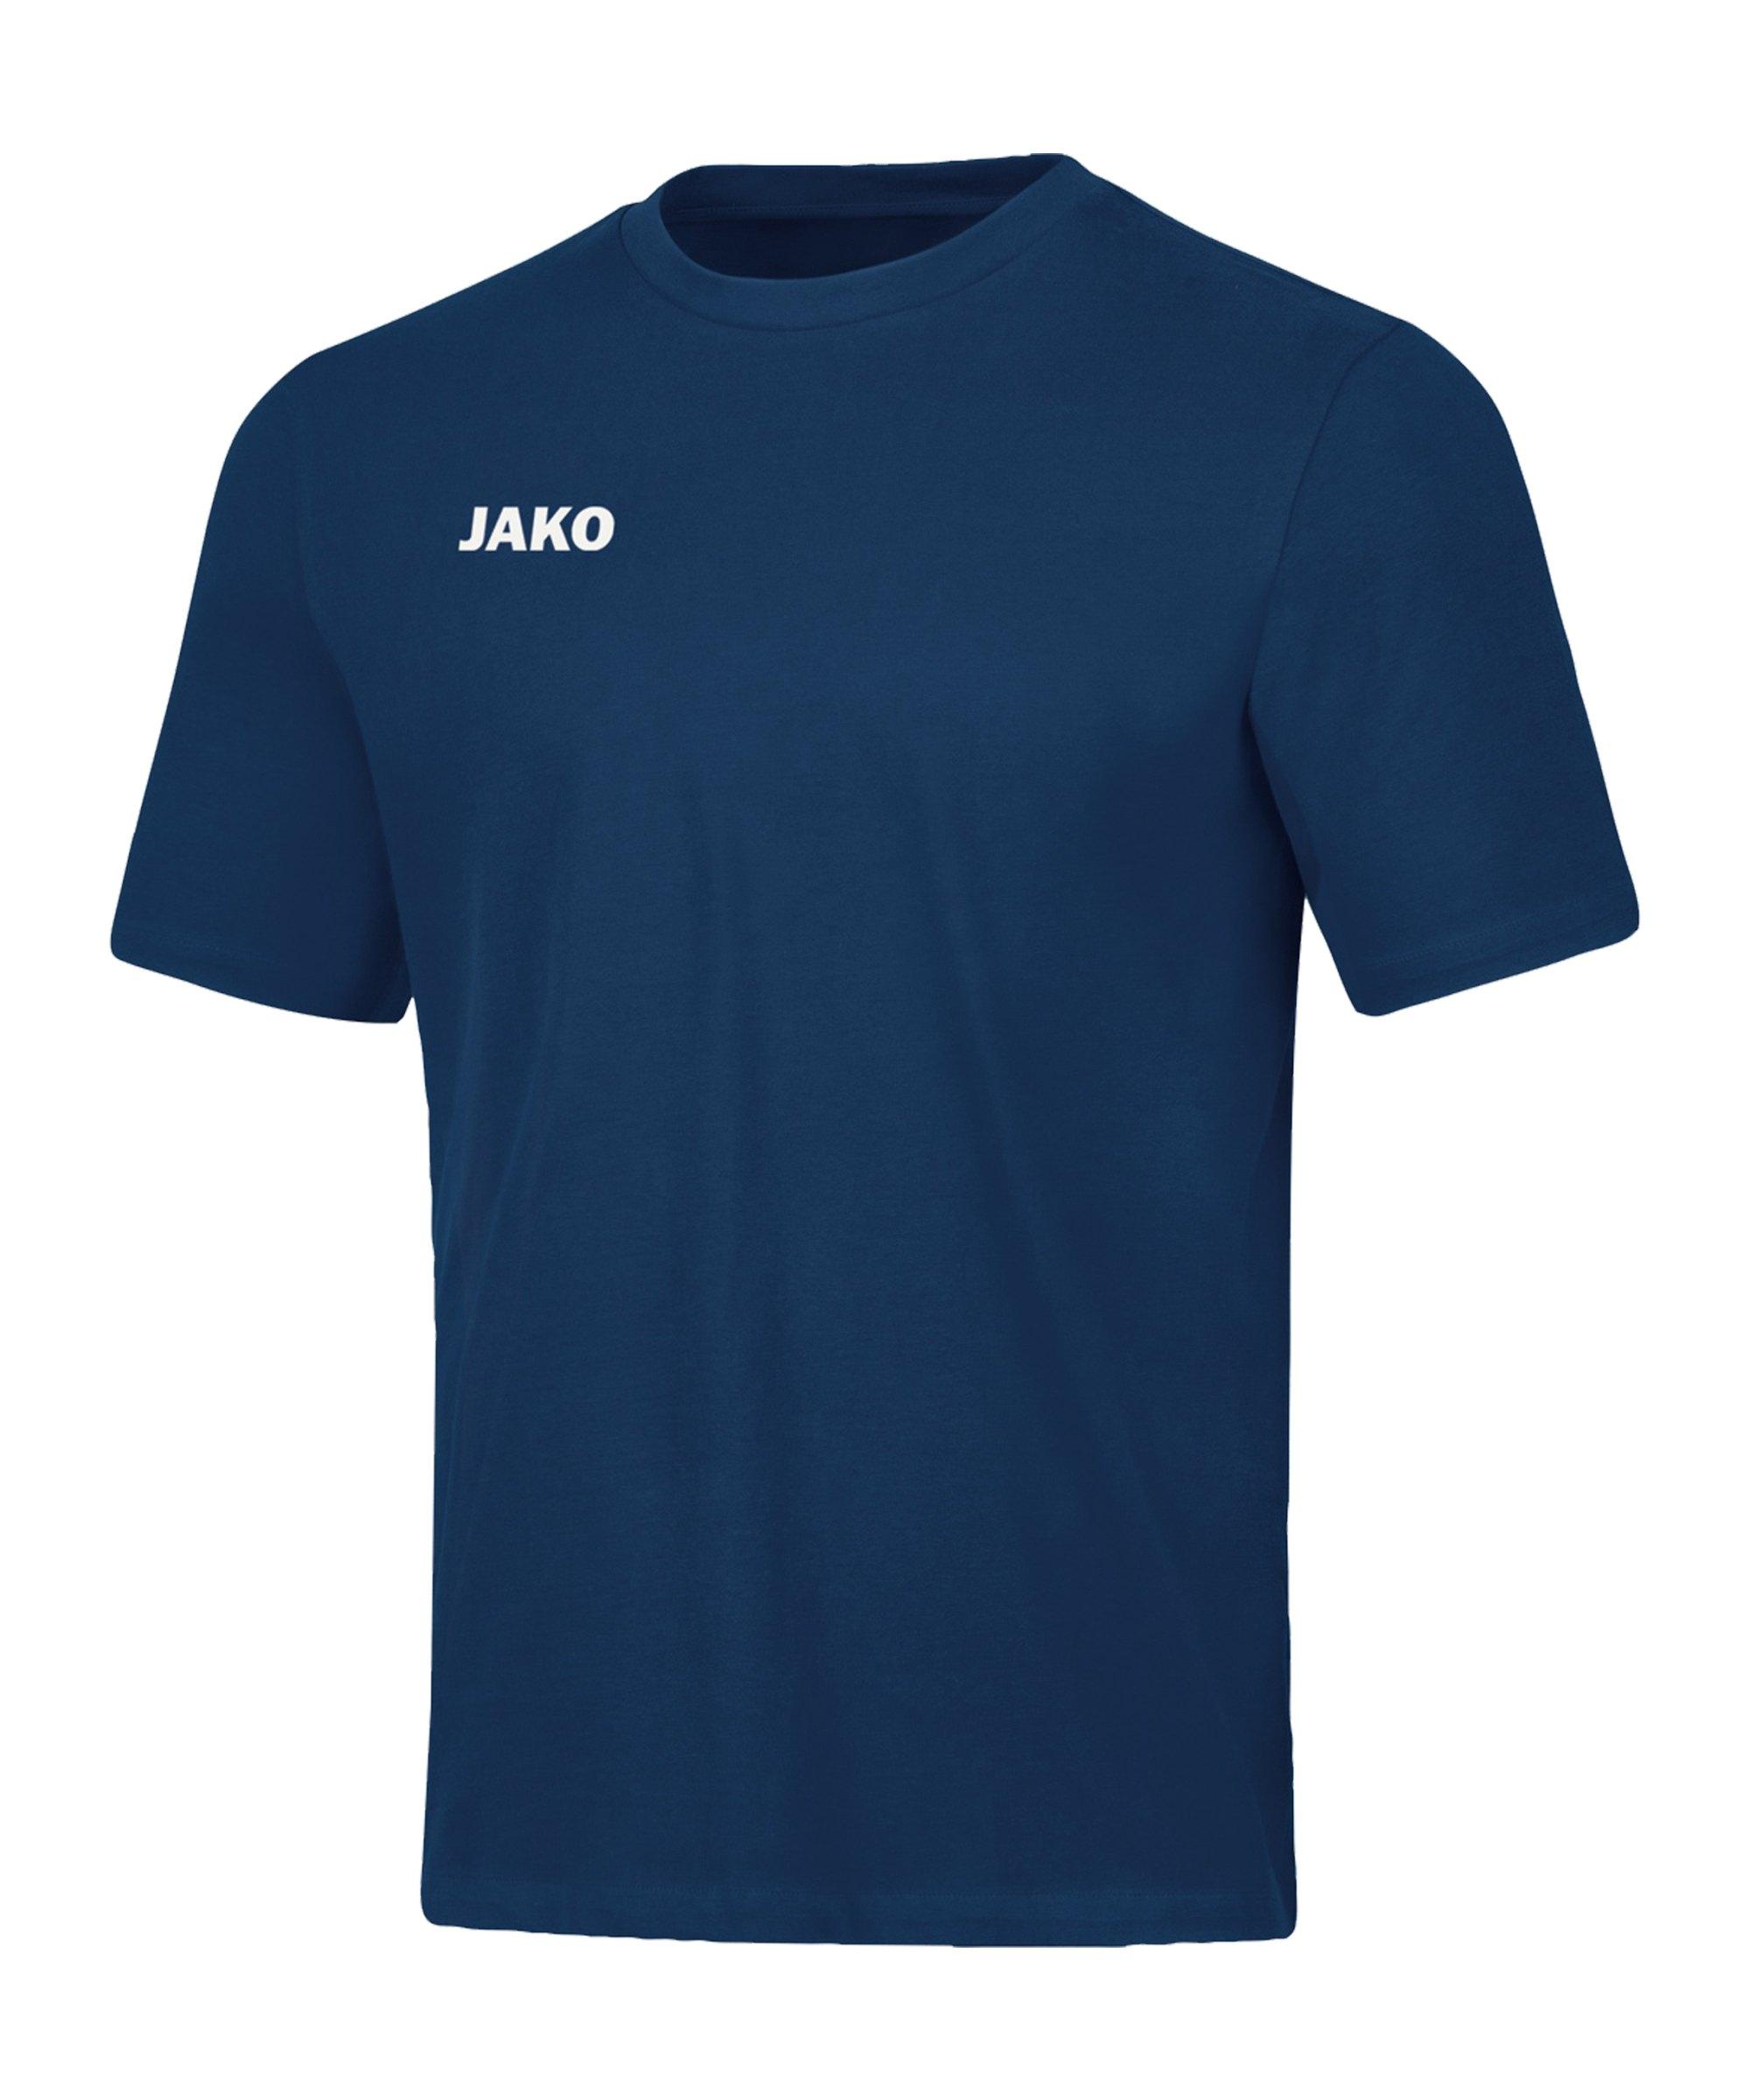 JAKO Base T-Shirt Kids Blau F09 - blau